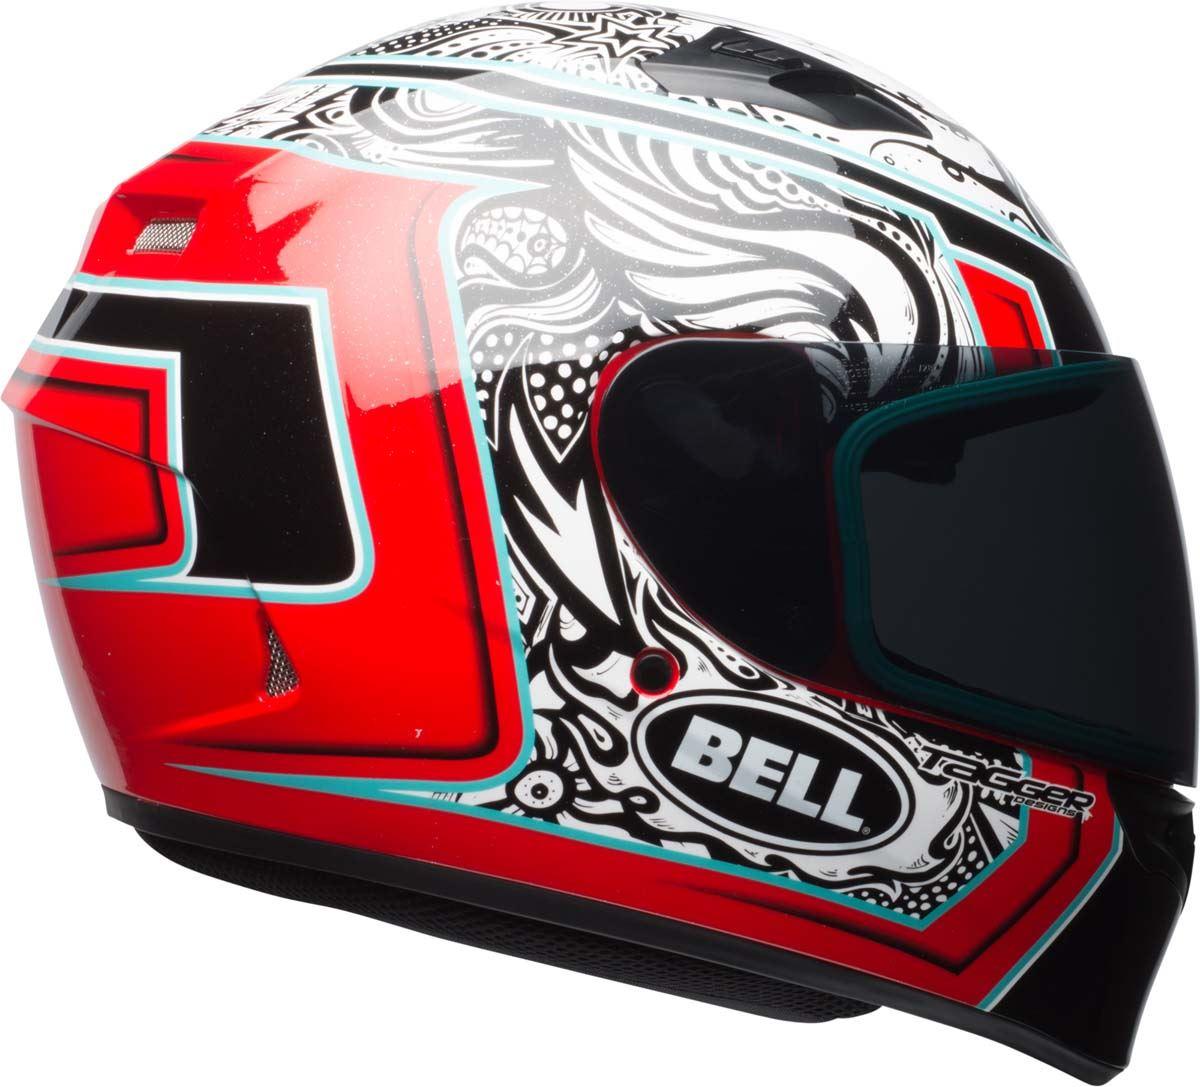 Bell-Qualifier-Helmet-Full-Face-Motorcycle-Clear-Shield-DOT-XS-3XL miniature 48